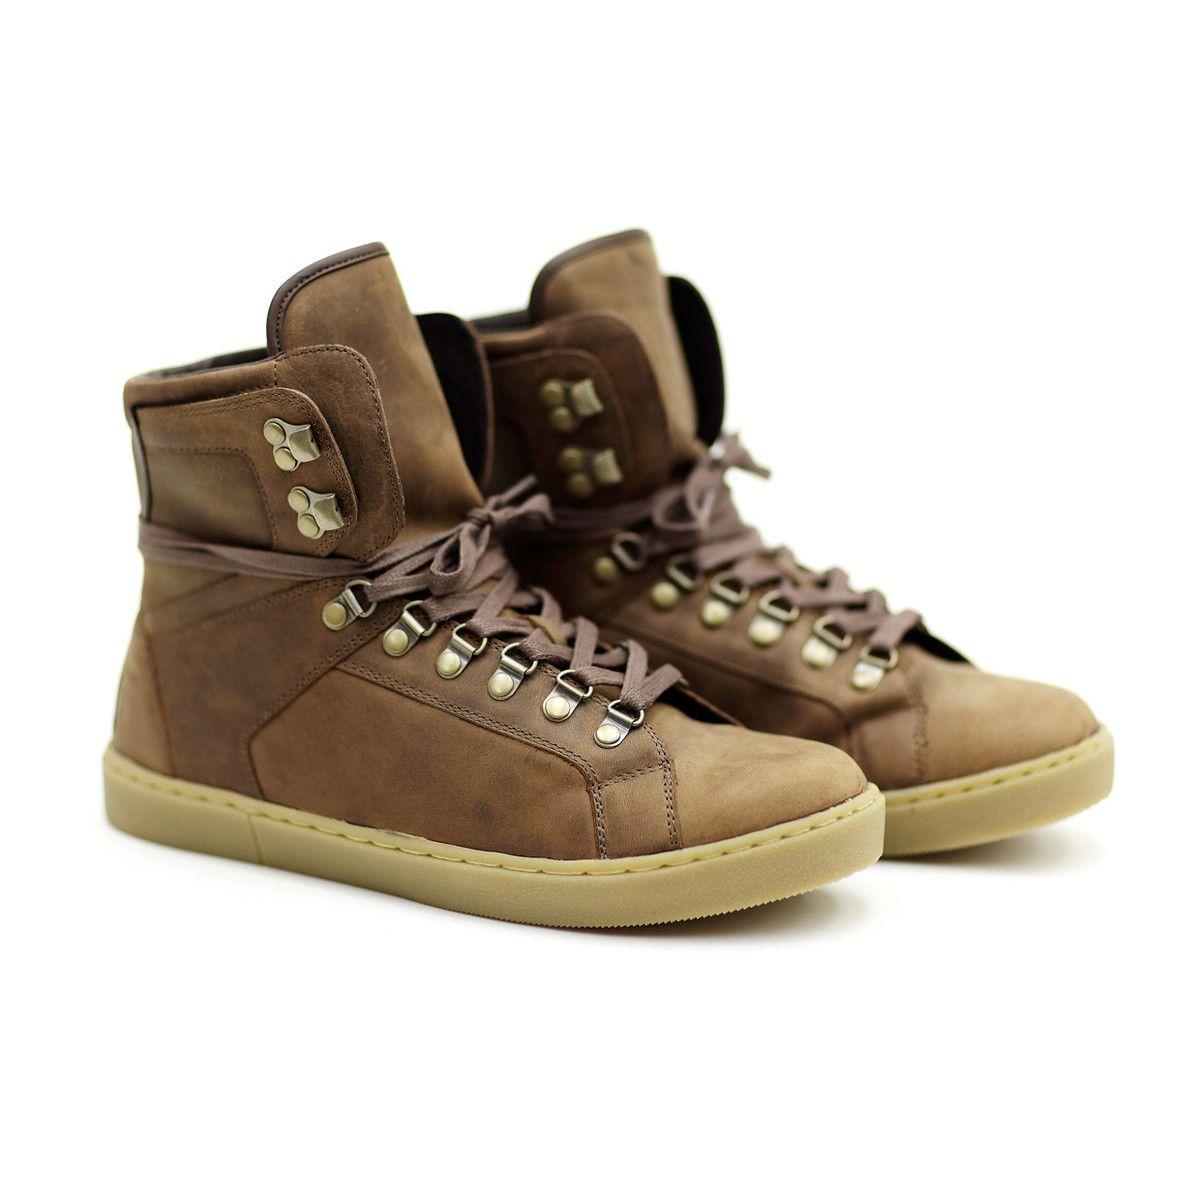 6fe0e5c9371 Lumberjack Men s Brown by Shoe The Bear